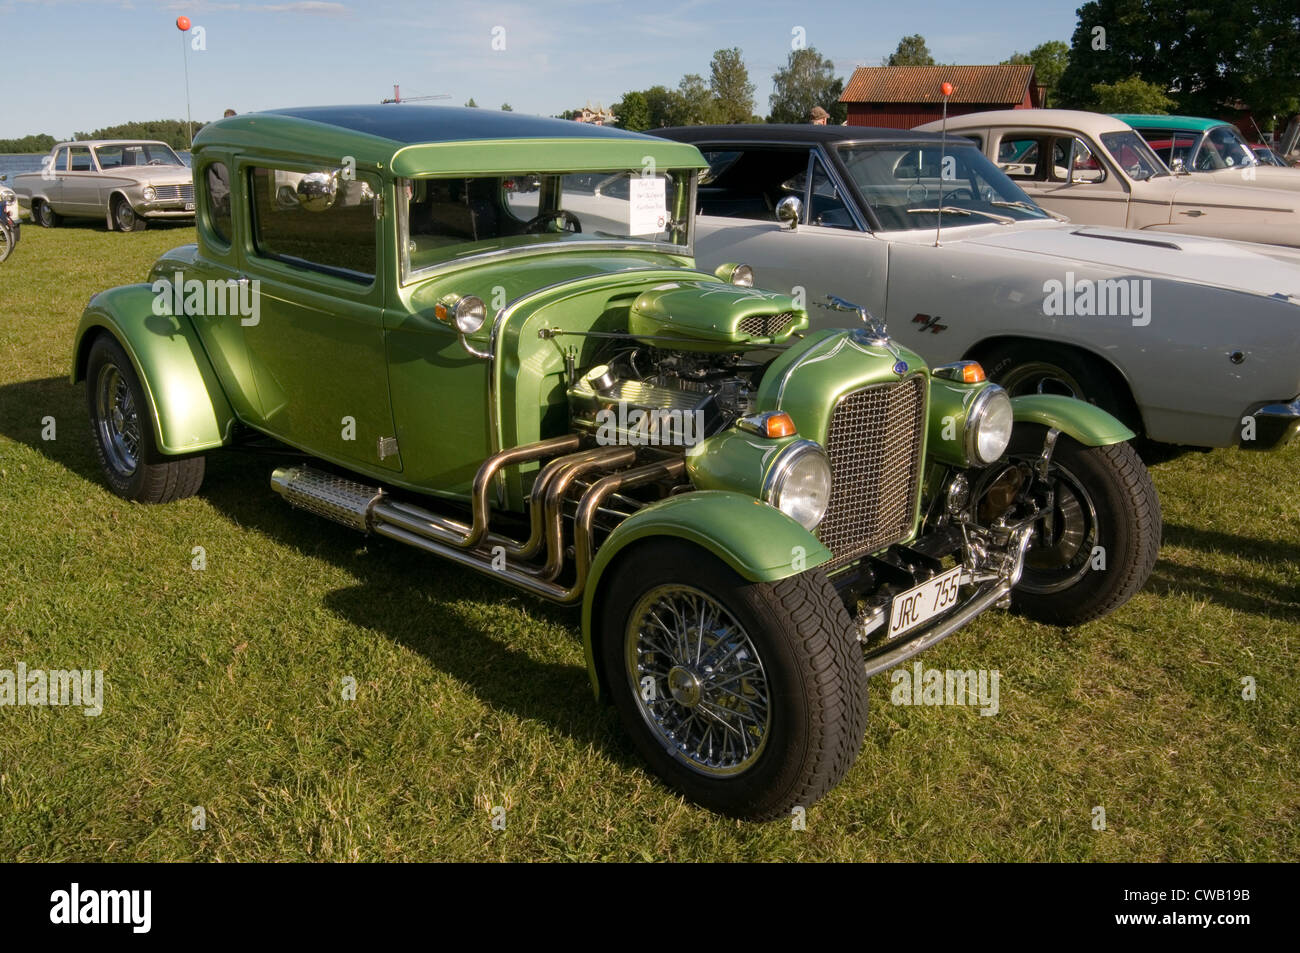 hot rod rods custom car cars customized model A ford customised ...